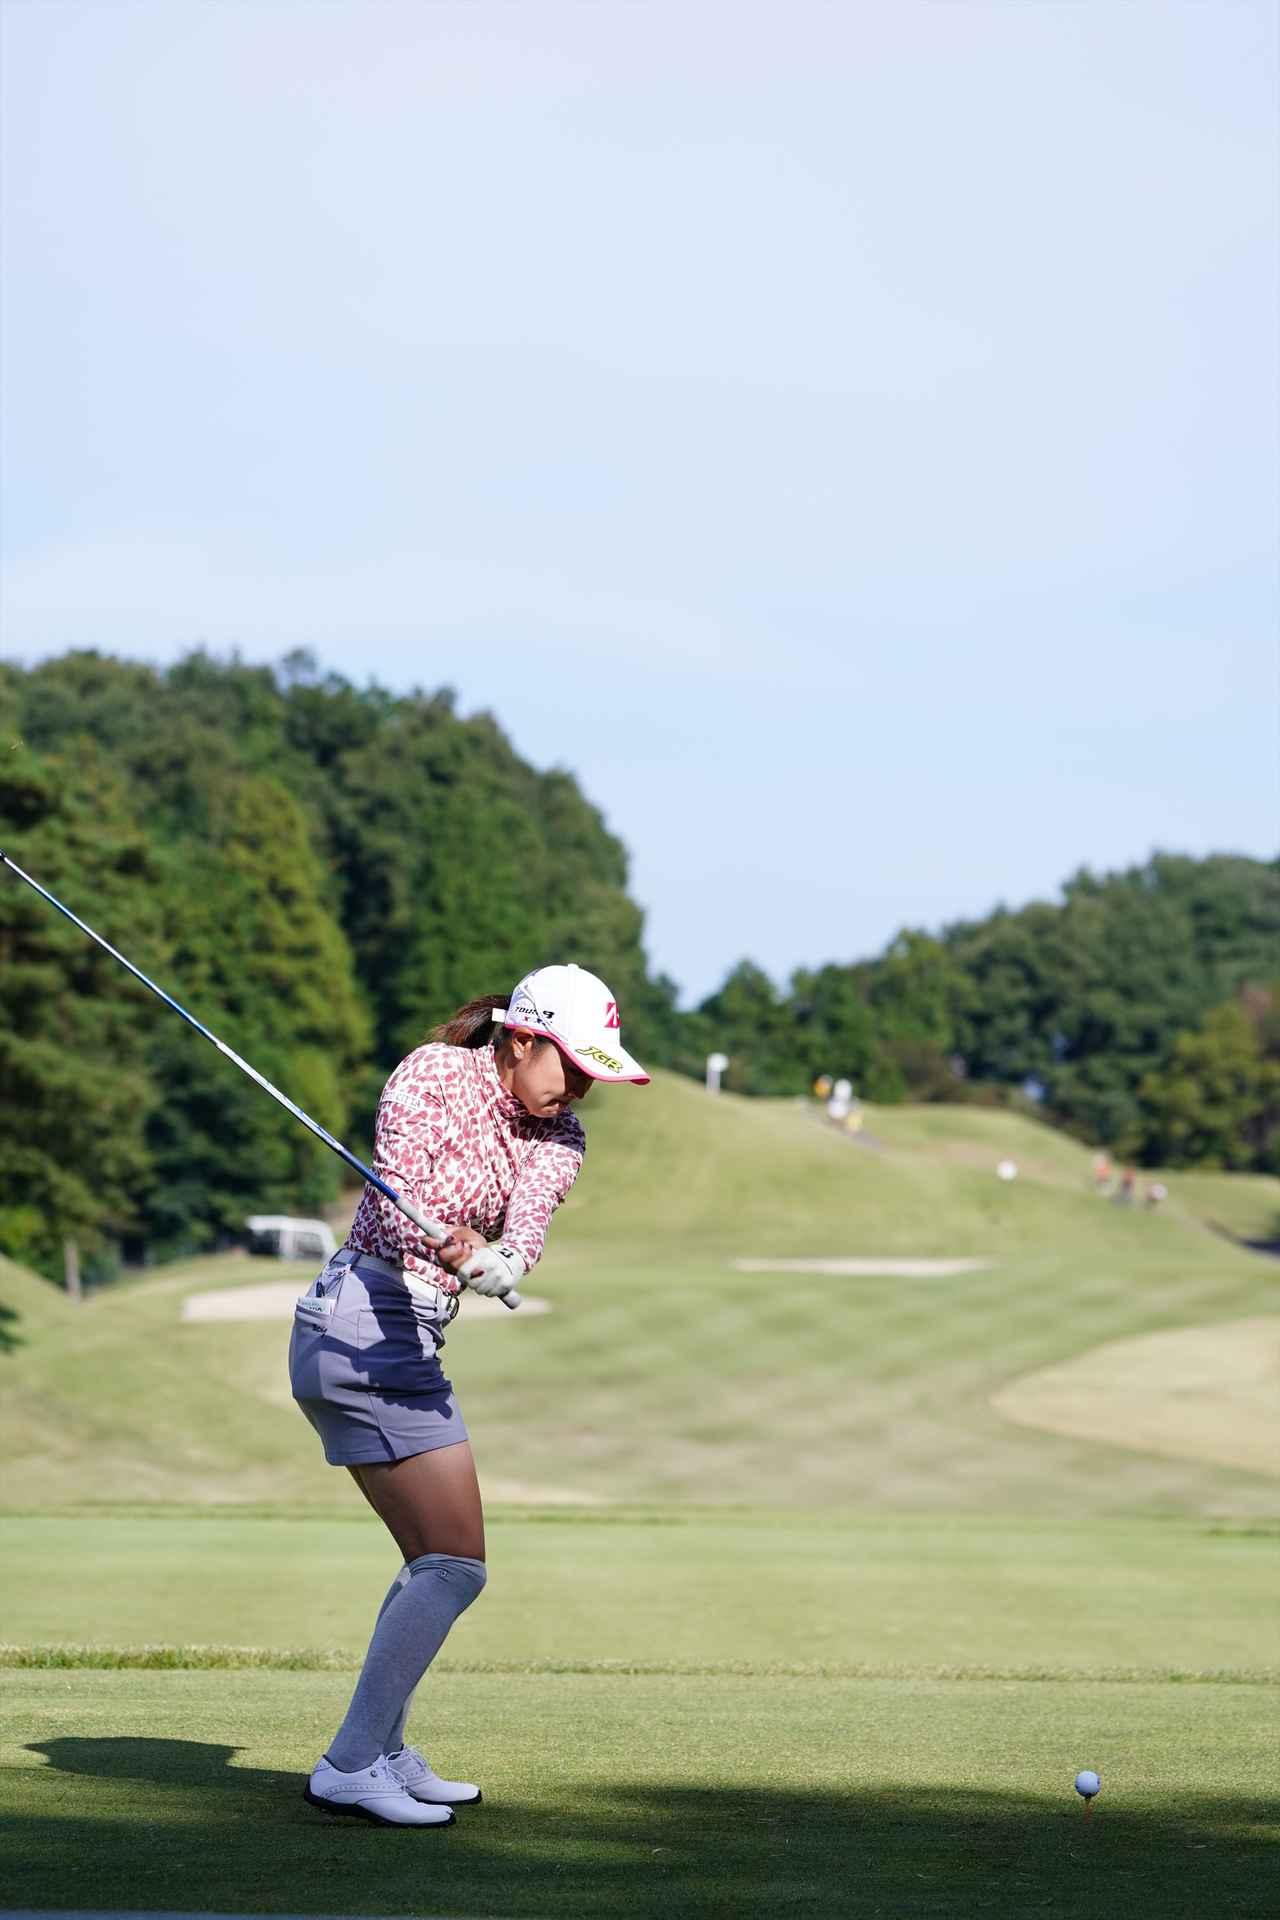 Images : 9番目の画像 - 高木優奈 ドライバー後方連続写真 - みんなのゴルフダイジェスト